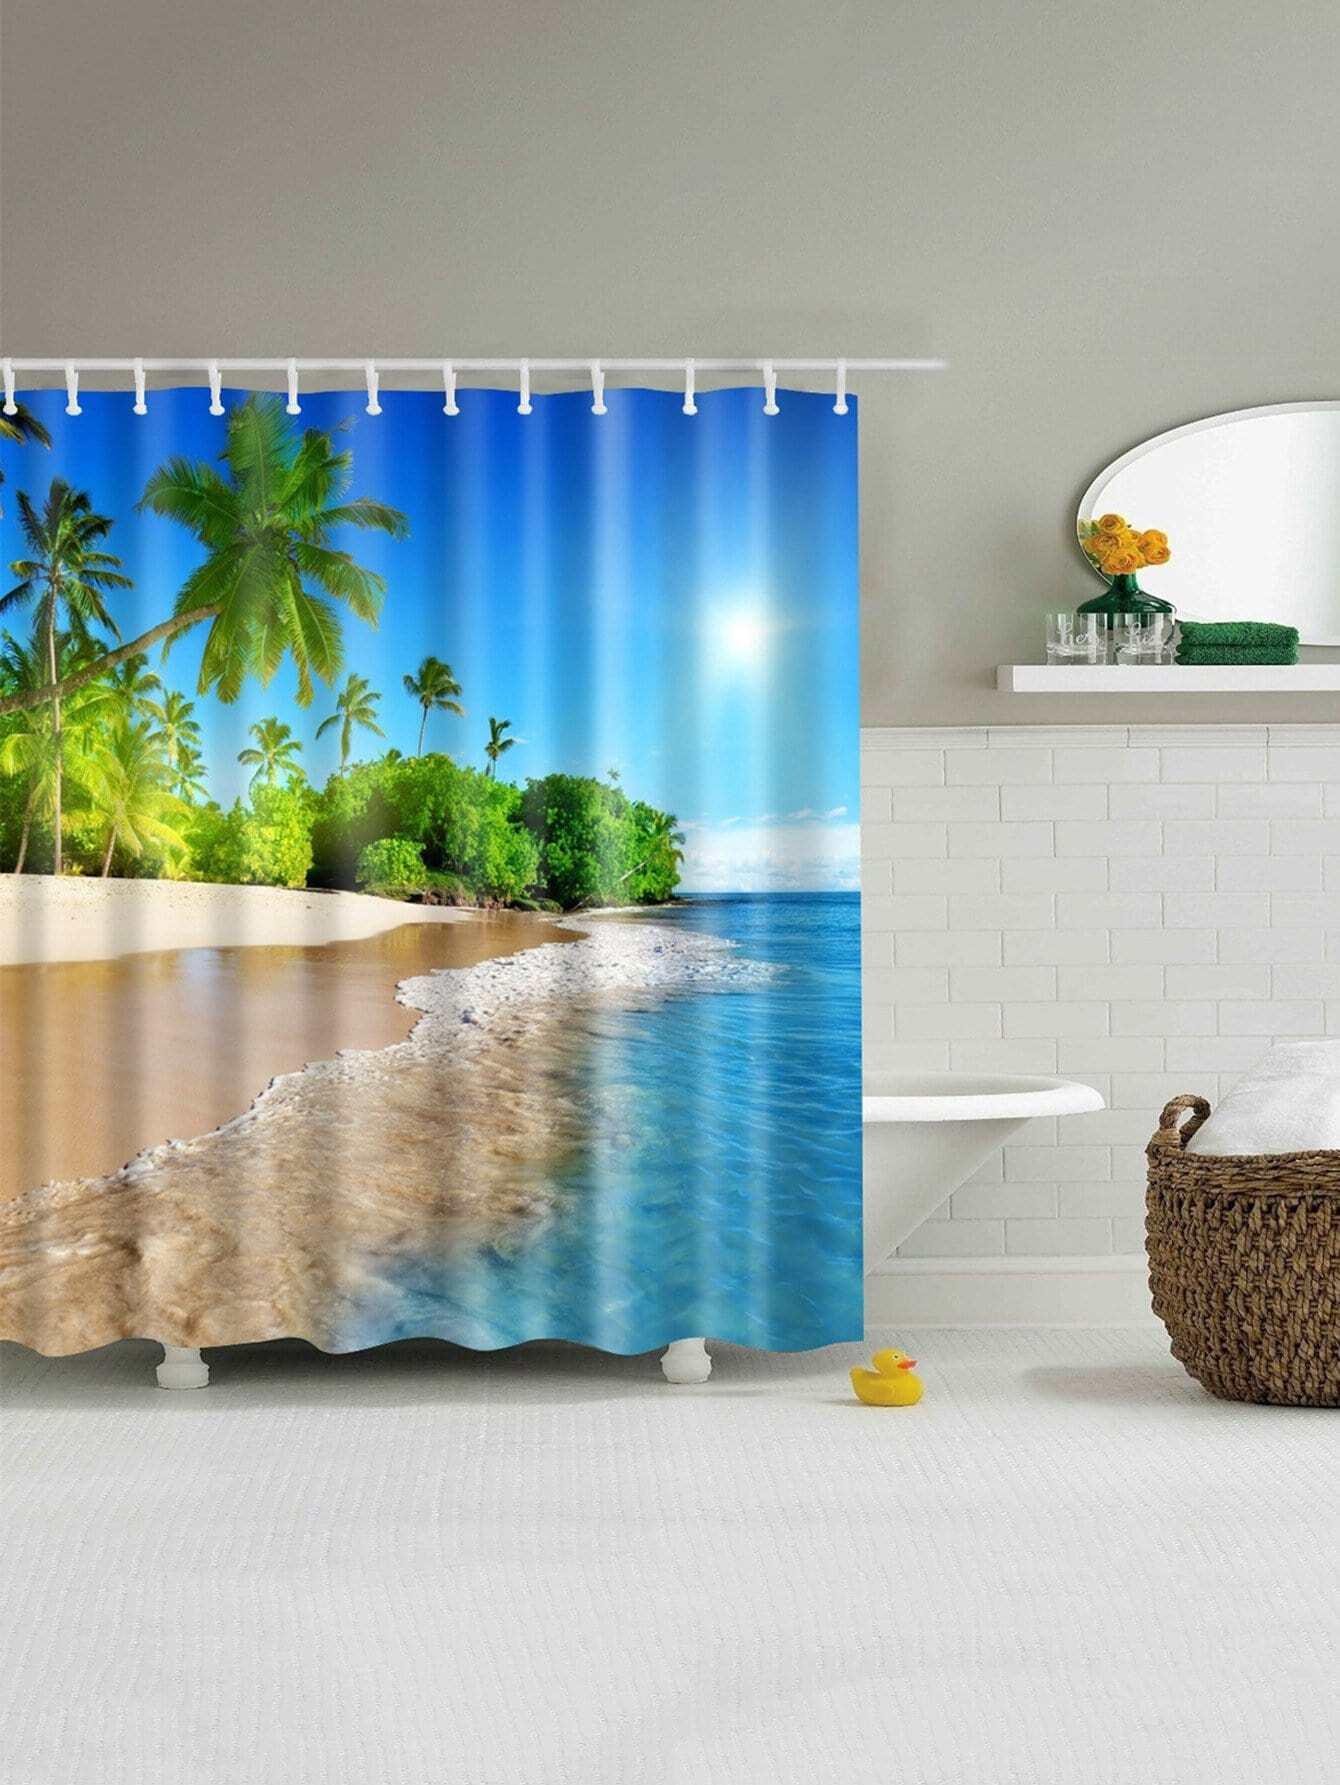 Sandbeach Shower Curtain With Hook 12pcs geometric shower curtain with 12pcs hook